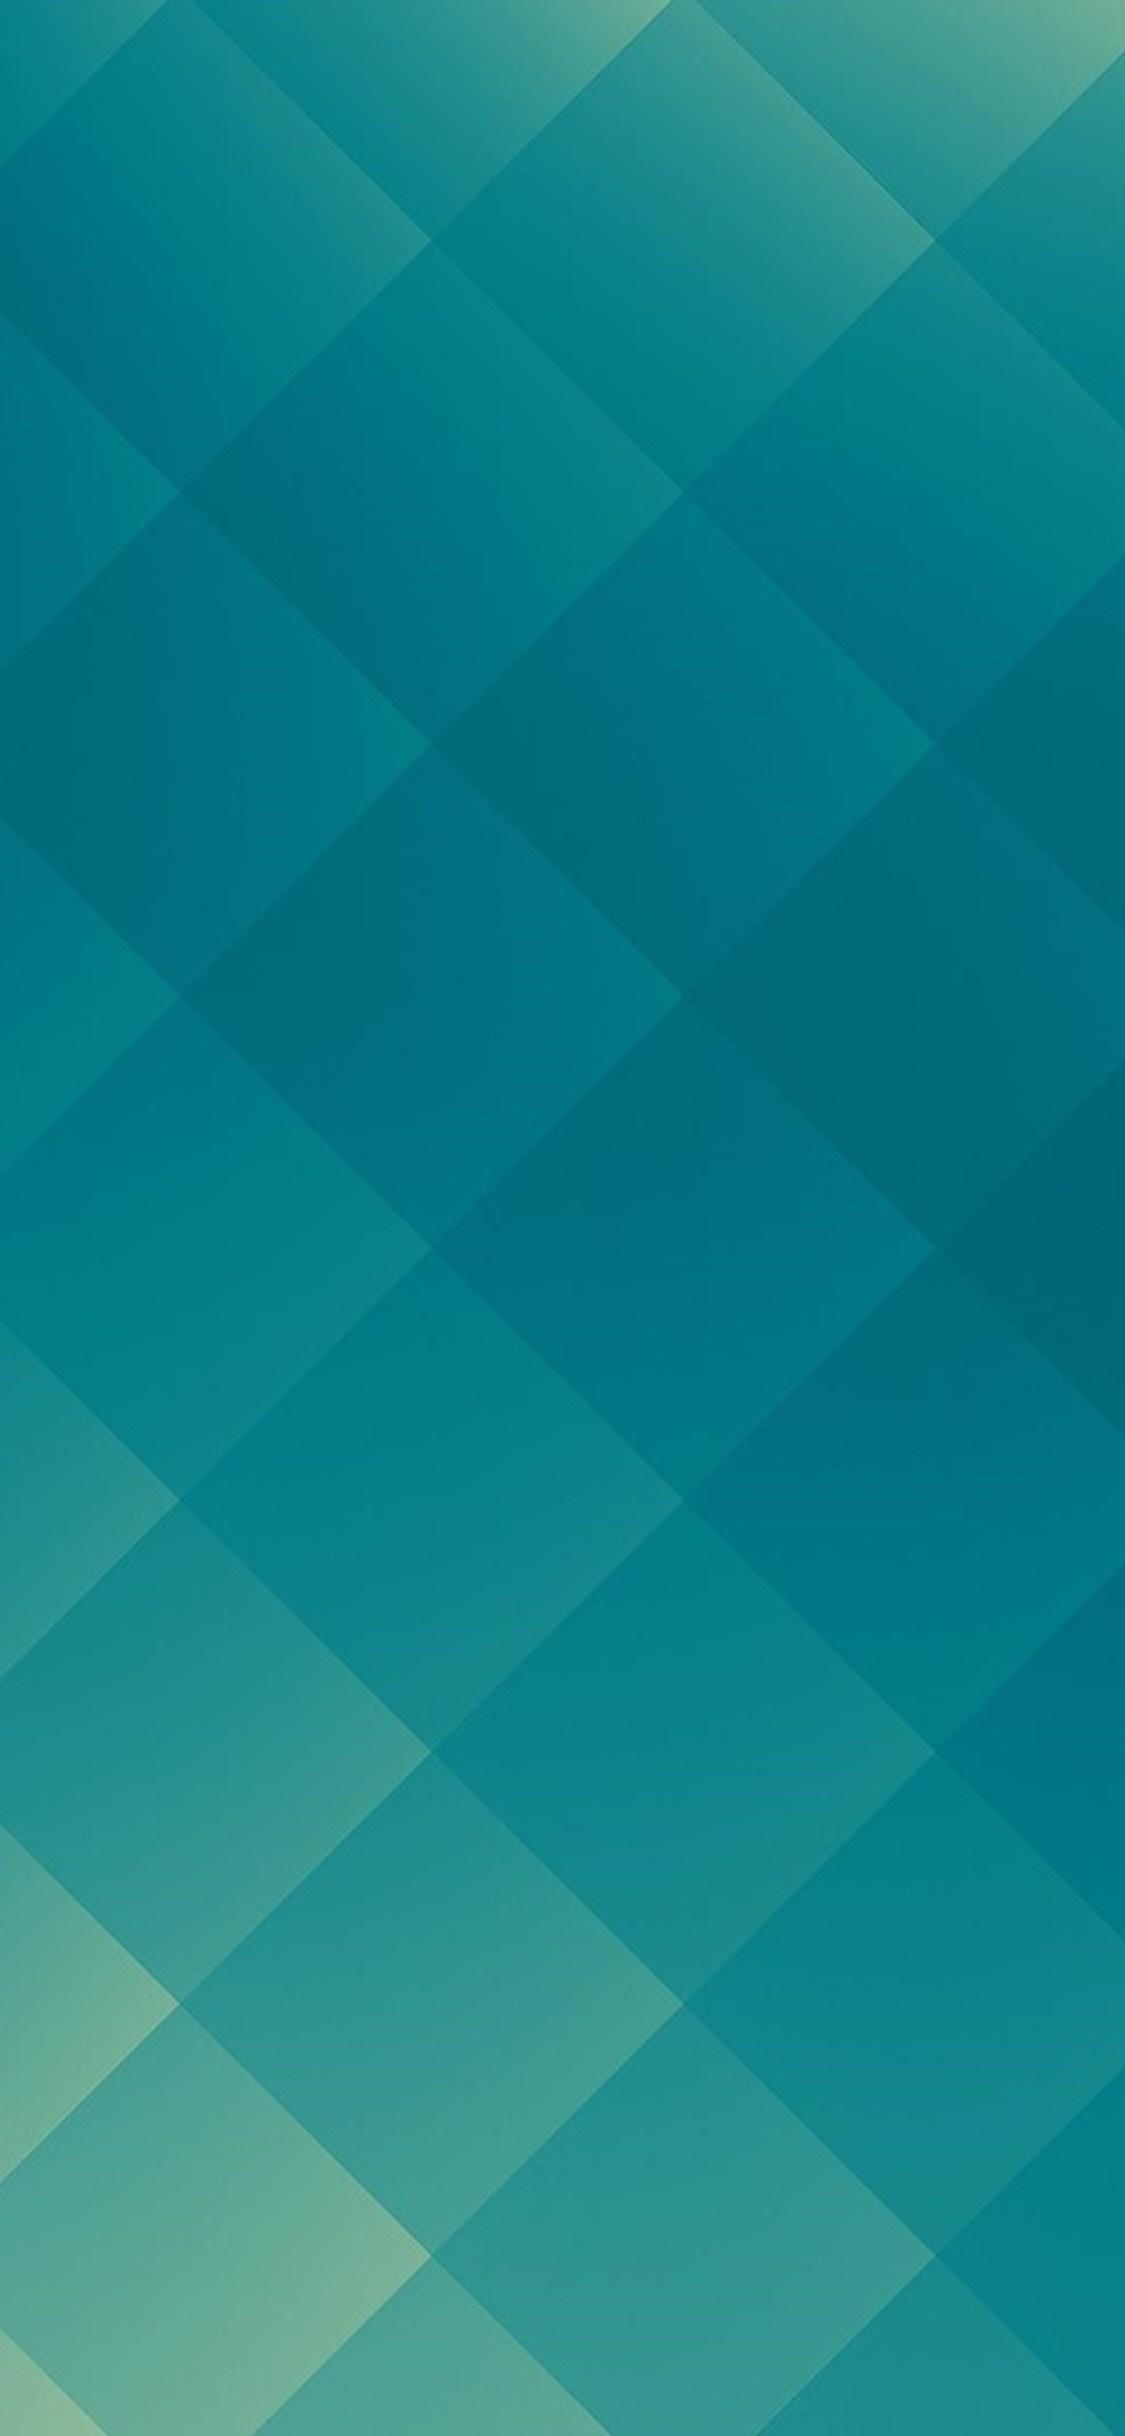 1125x2436 Gradient Texture Cubes Iphone Xs Iphone 10 Iphone